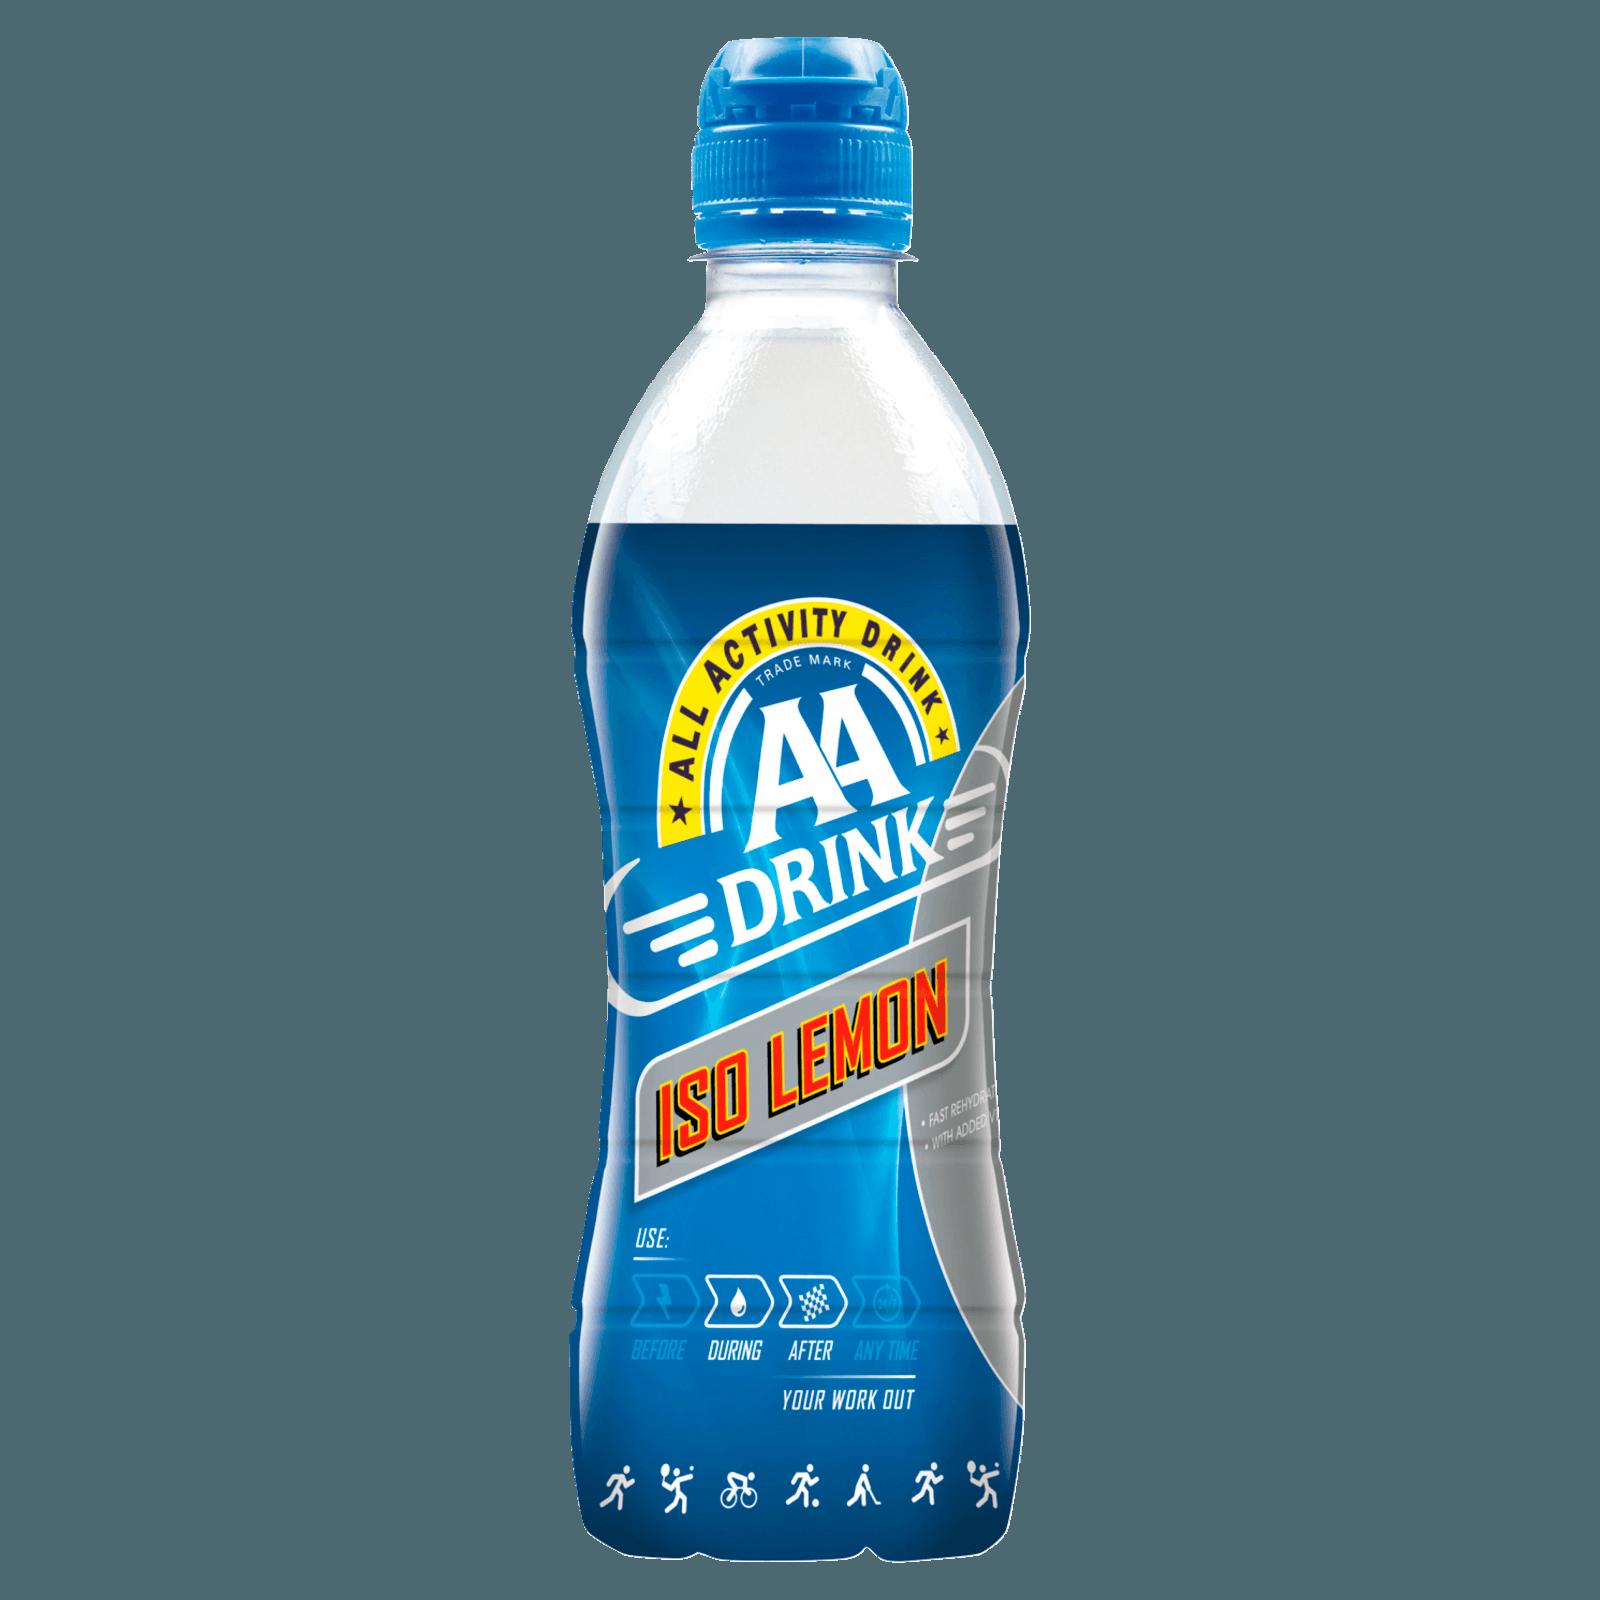 AA Drink Iso Lemon 0,5l bei REWE online bestellen!